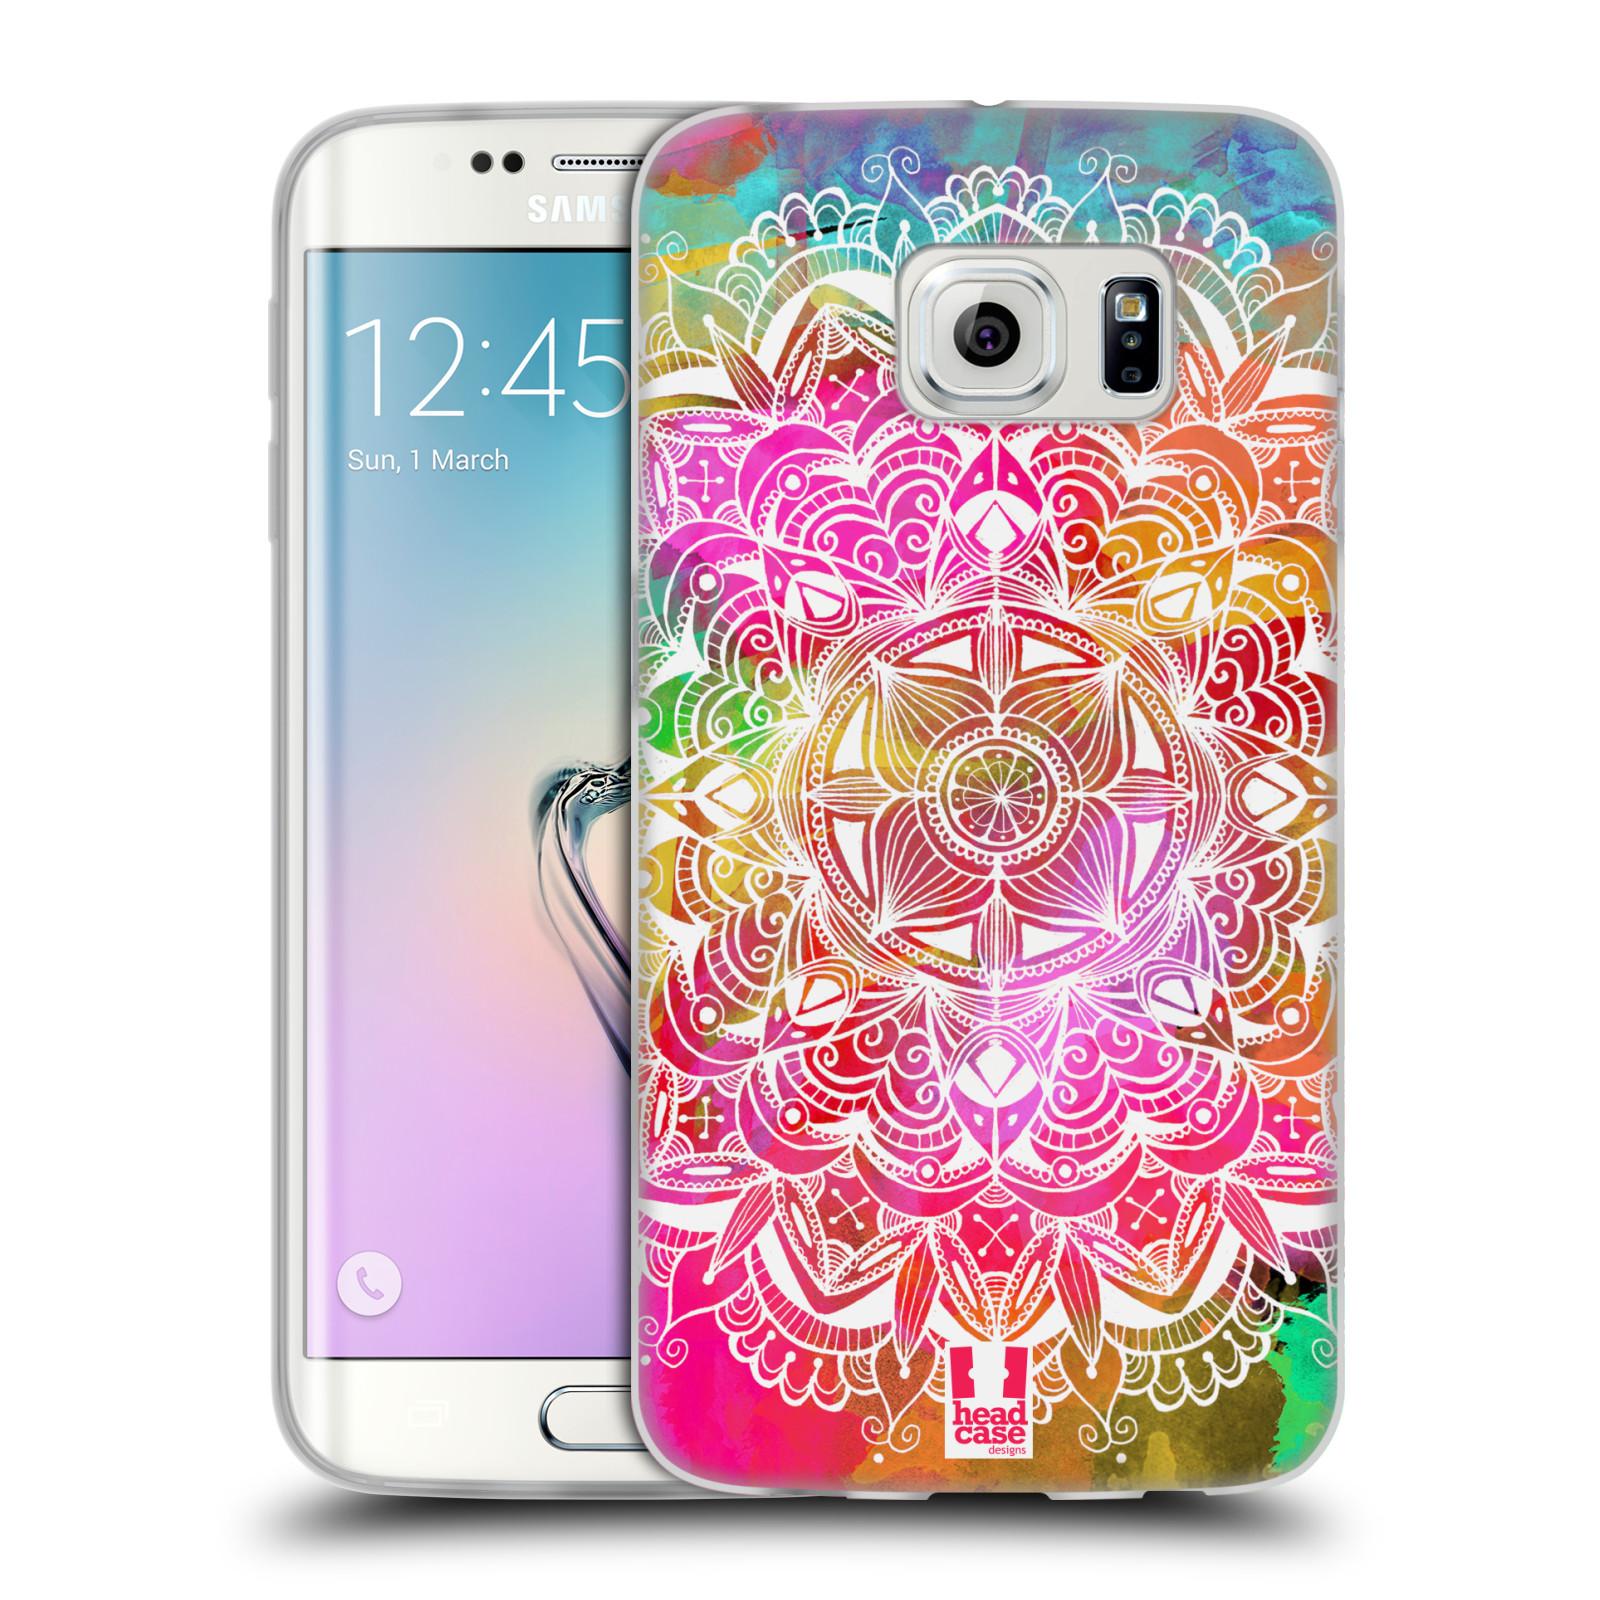 Silikonové pouzdro na mobil Samsung Galaxy S6 Edge HEAD CASE Mandala Doodle Watercolour (Silikonový kryt či obal na mobilní telefon Samsung Galaxy S6 Edge SM-G925F)